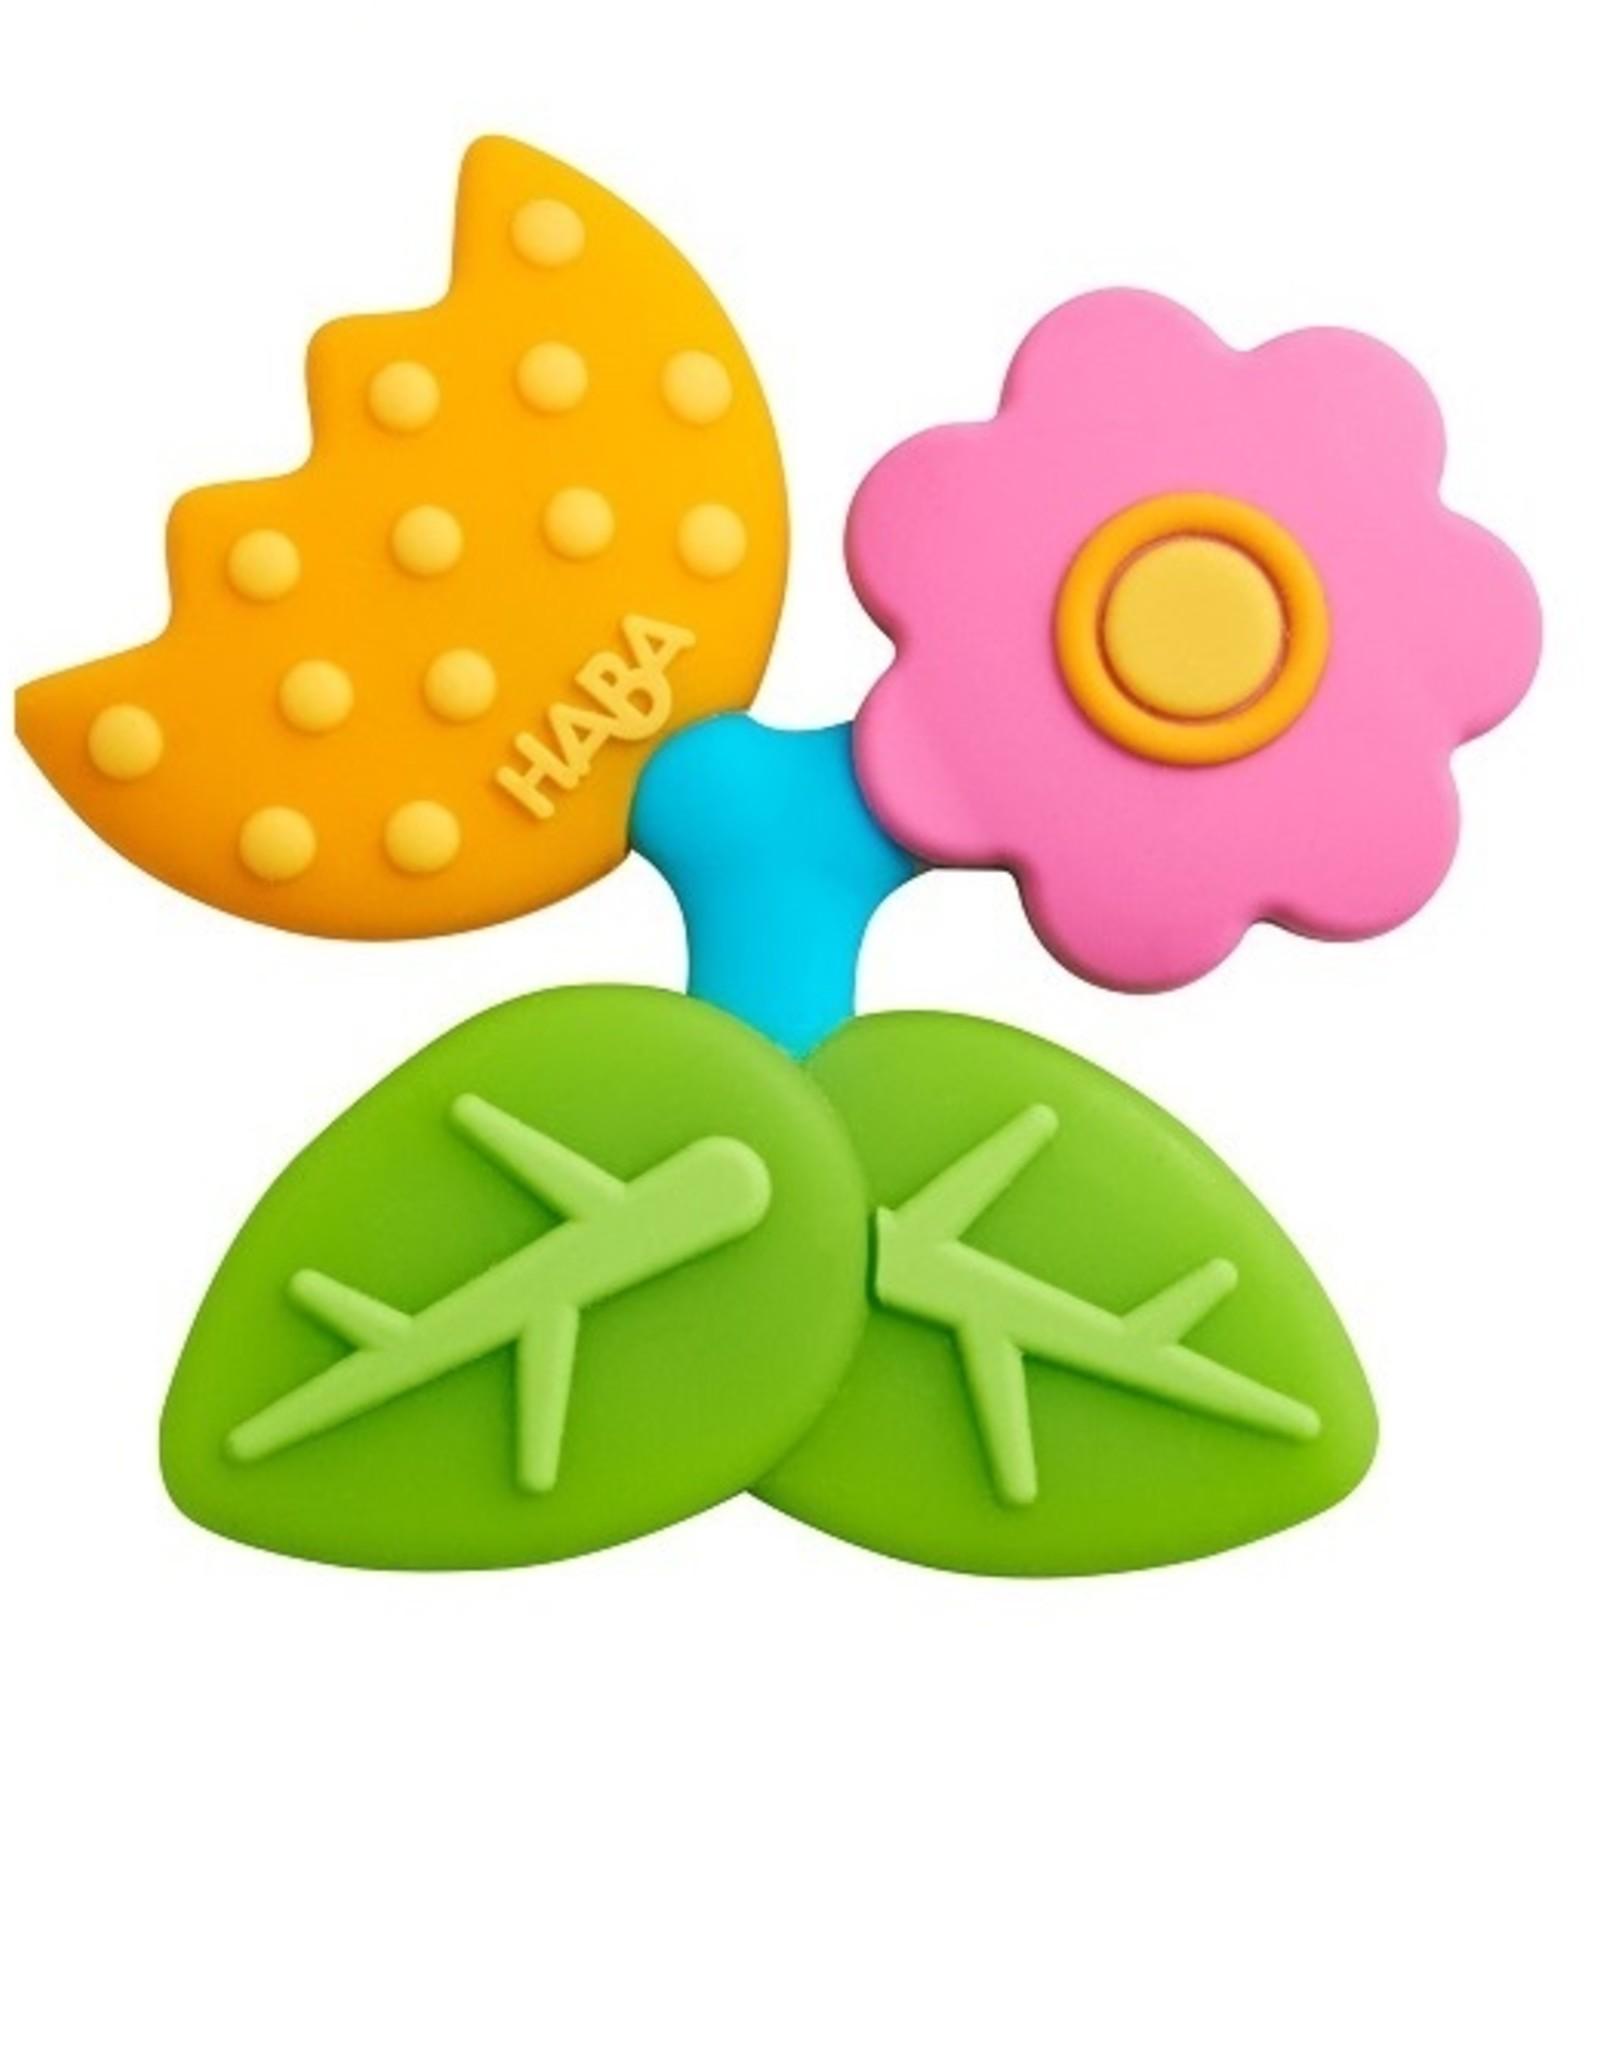 Haba Grijpspeeltje bloem, auto, kleurspel of muis